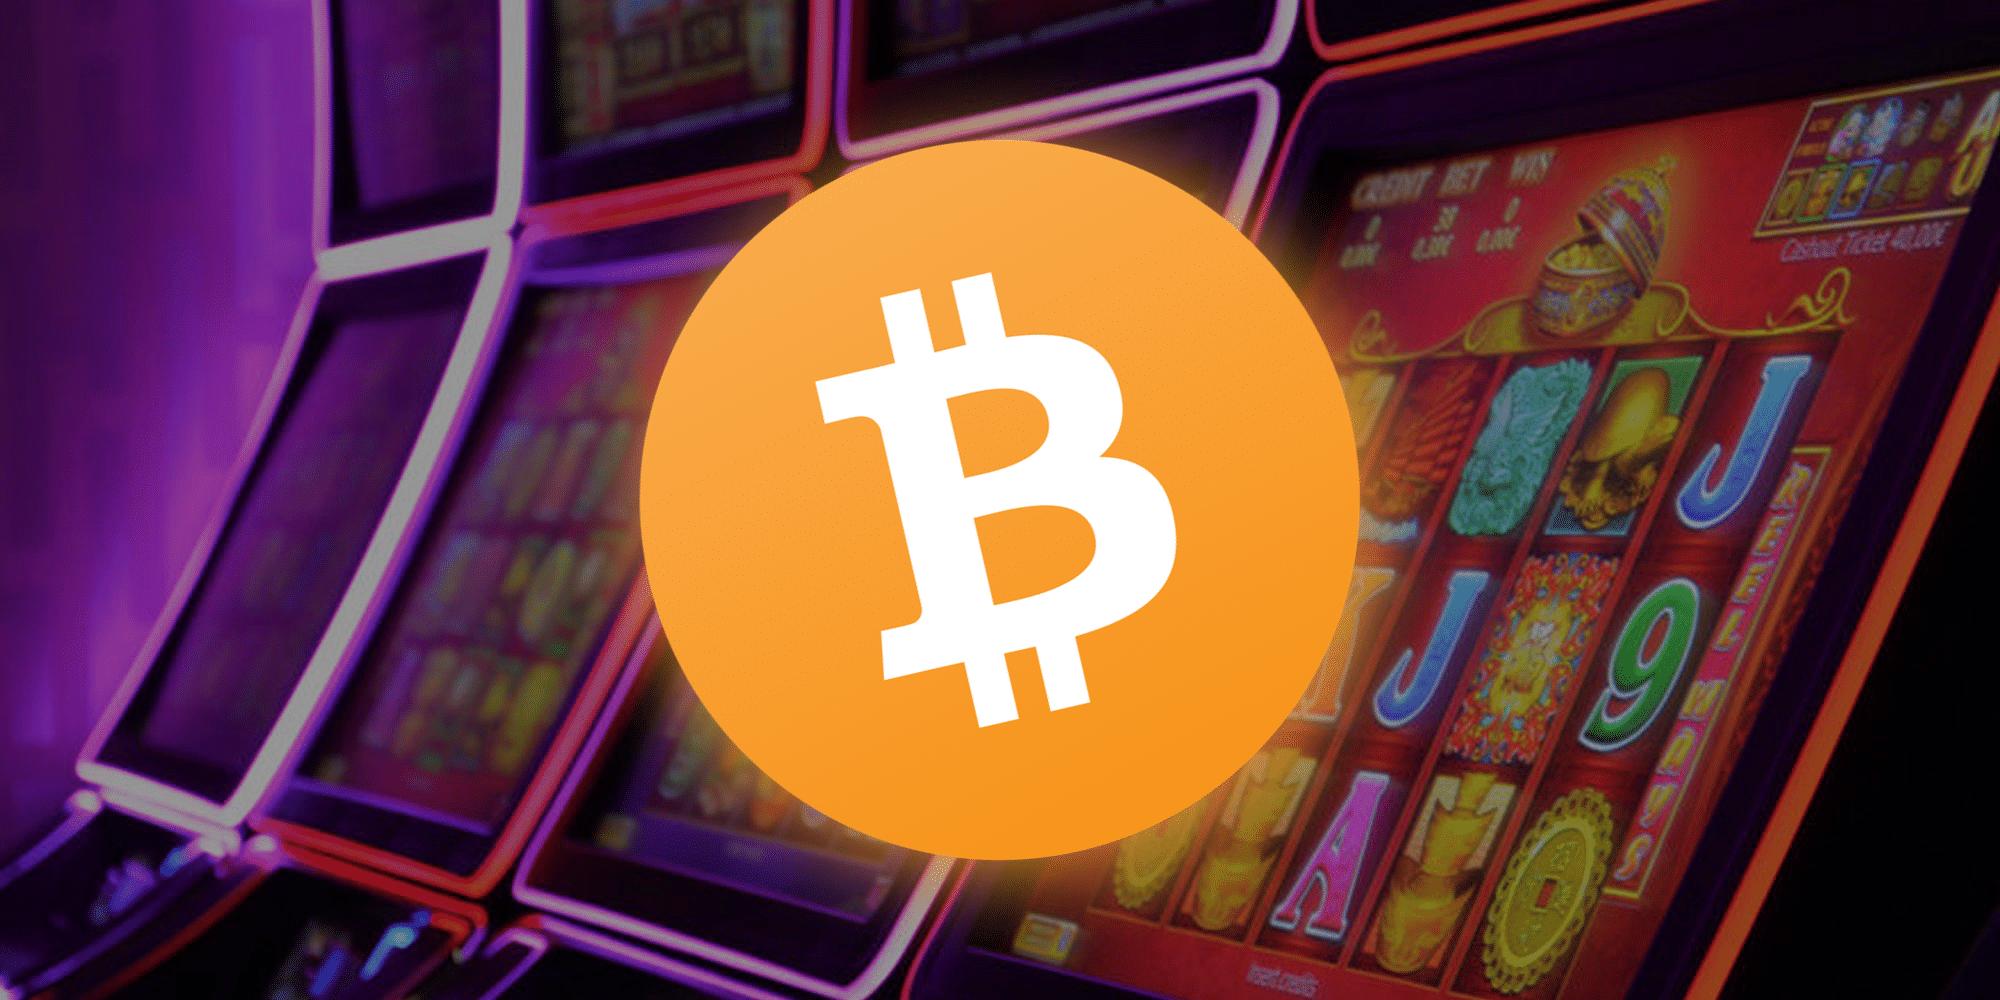 Bitcoin faucet uo1 net